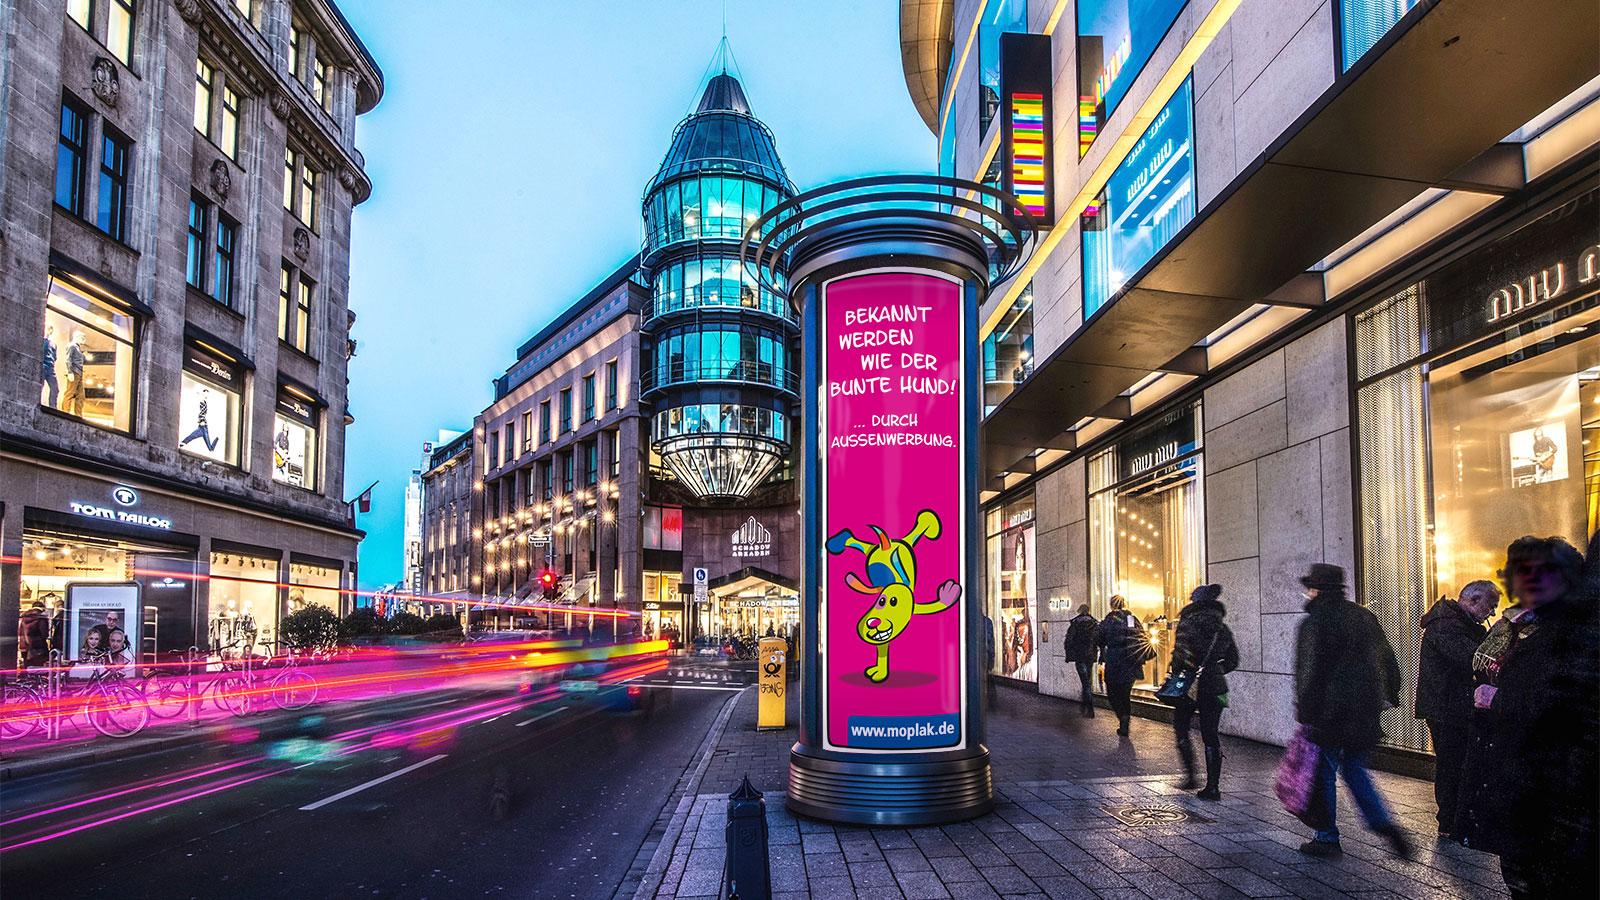 Jena-Aussenwerbung-Litfasssaeule-Werbung